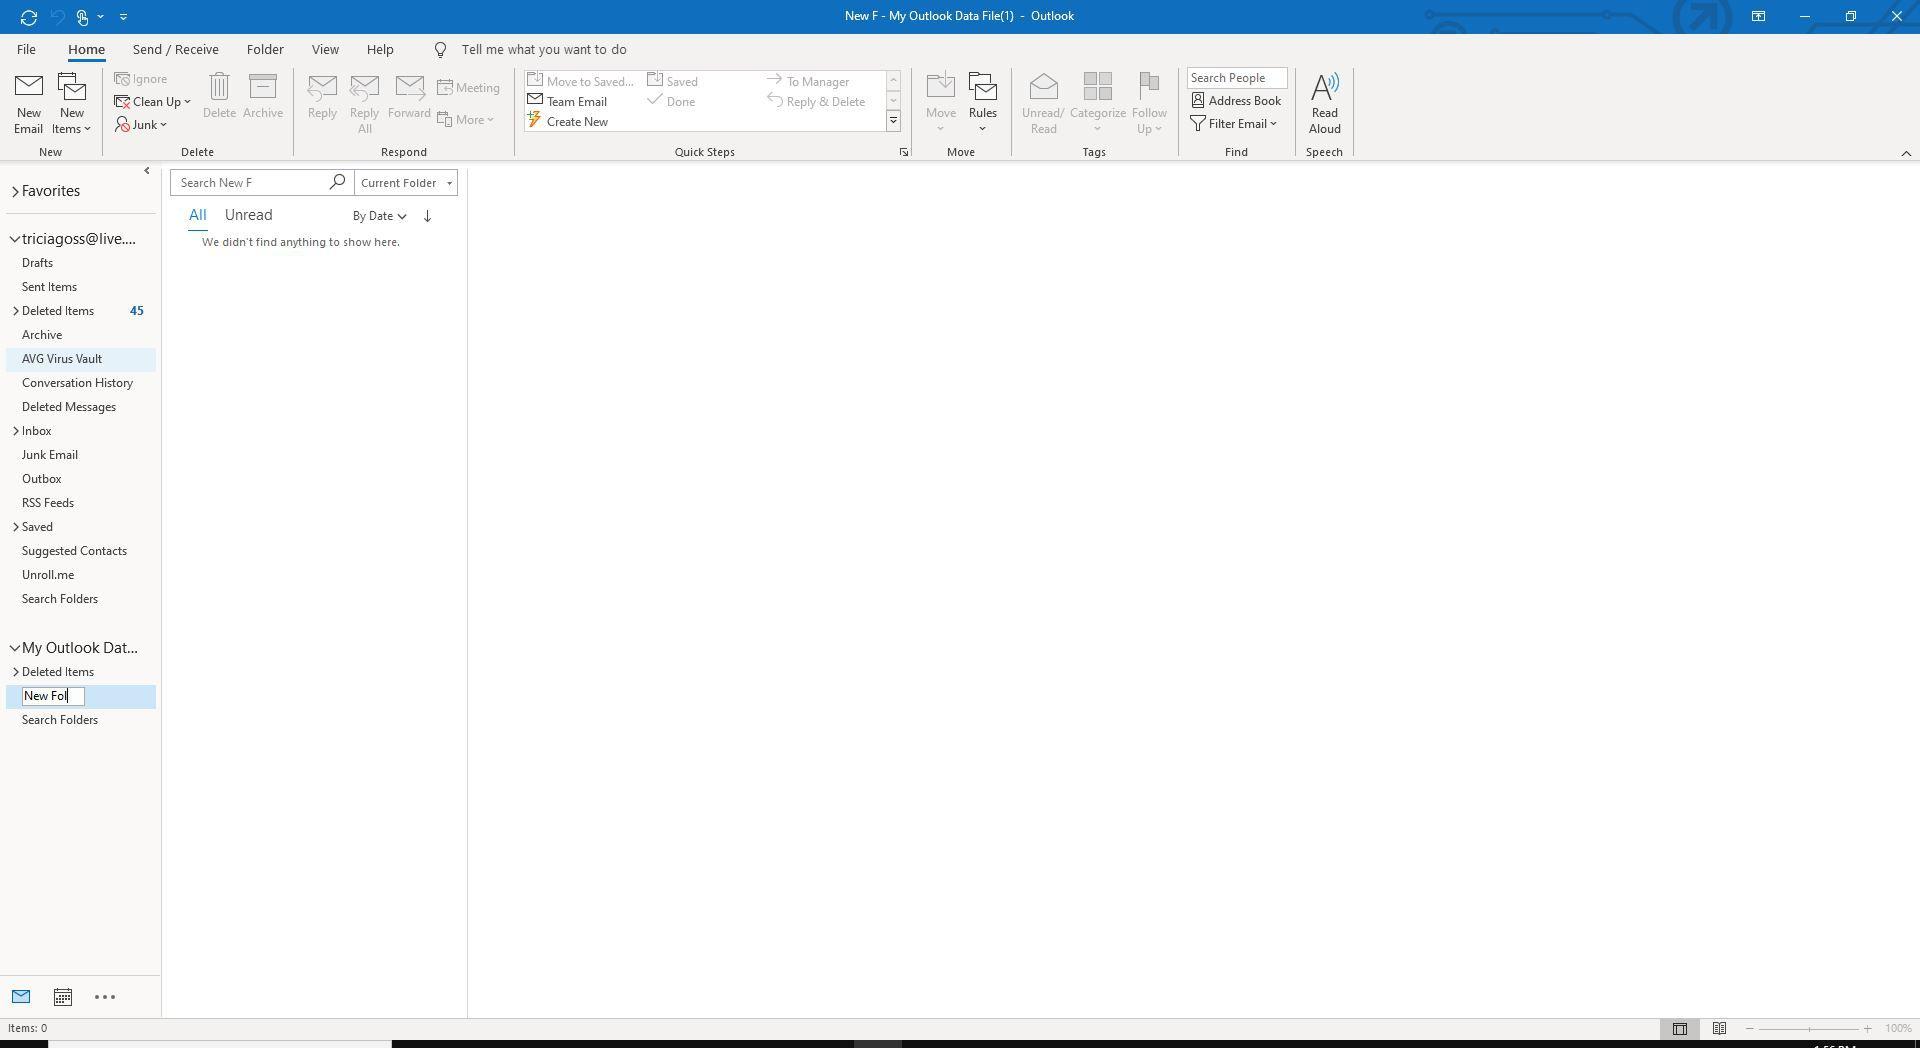 Screenshot of new folder name